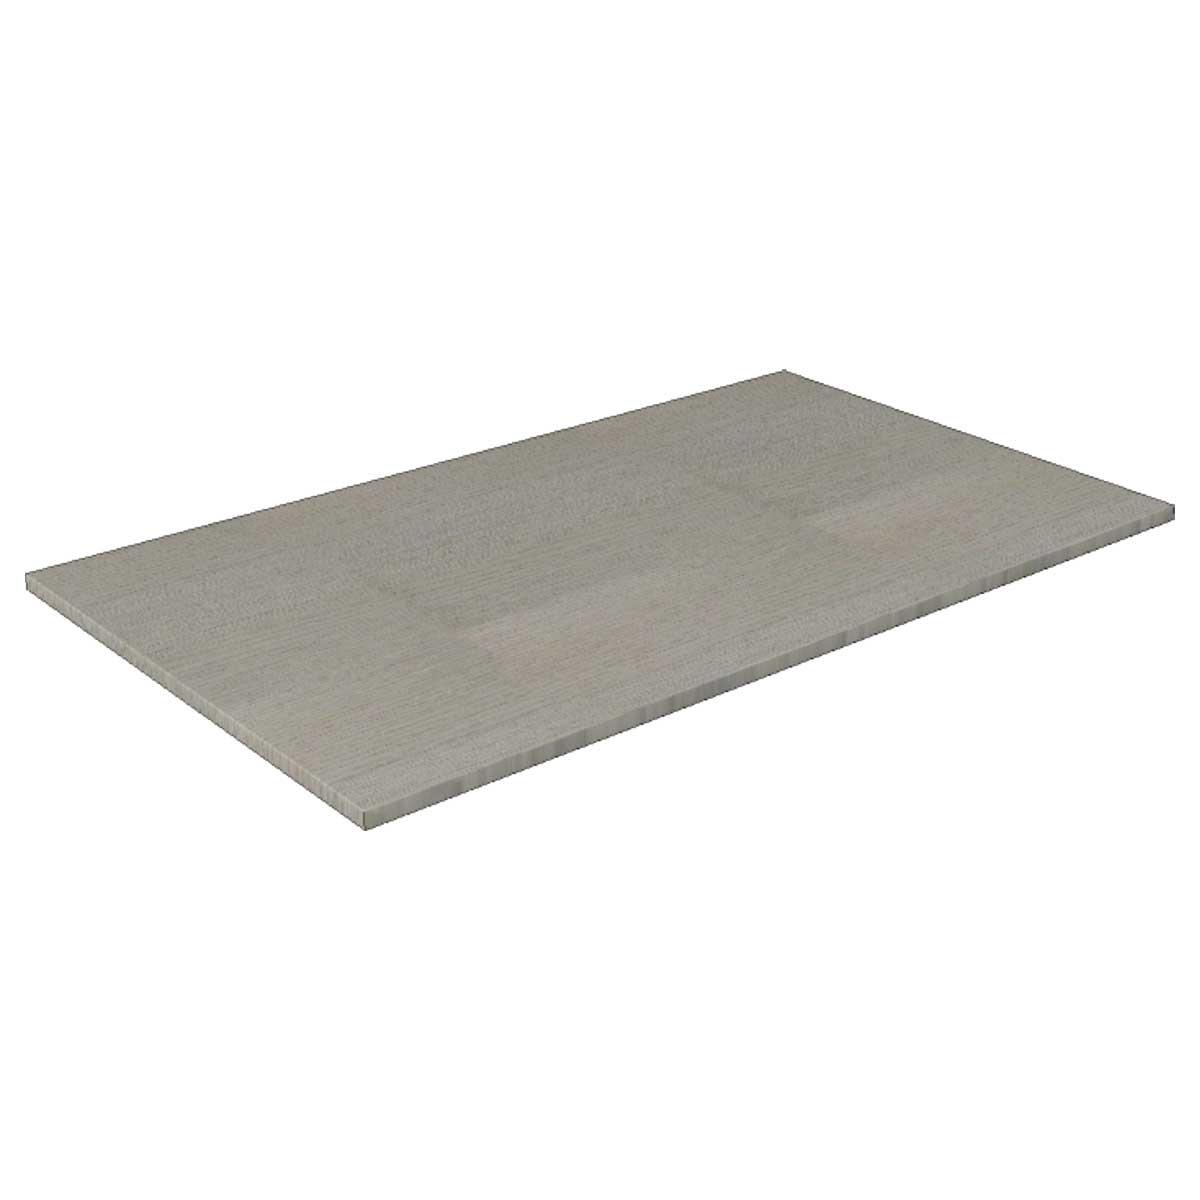 TICAM E120X70 4367 - https://www.werzalit.com/en/product/table-top-cambium-e-70x60cm-board-thickness-39cm-decor-courtrai/